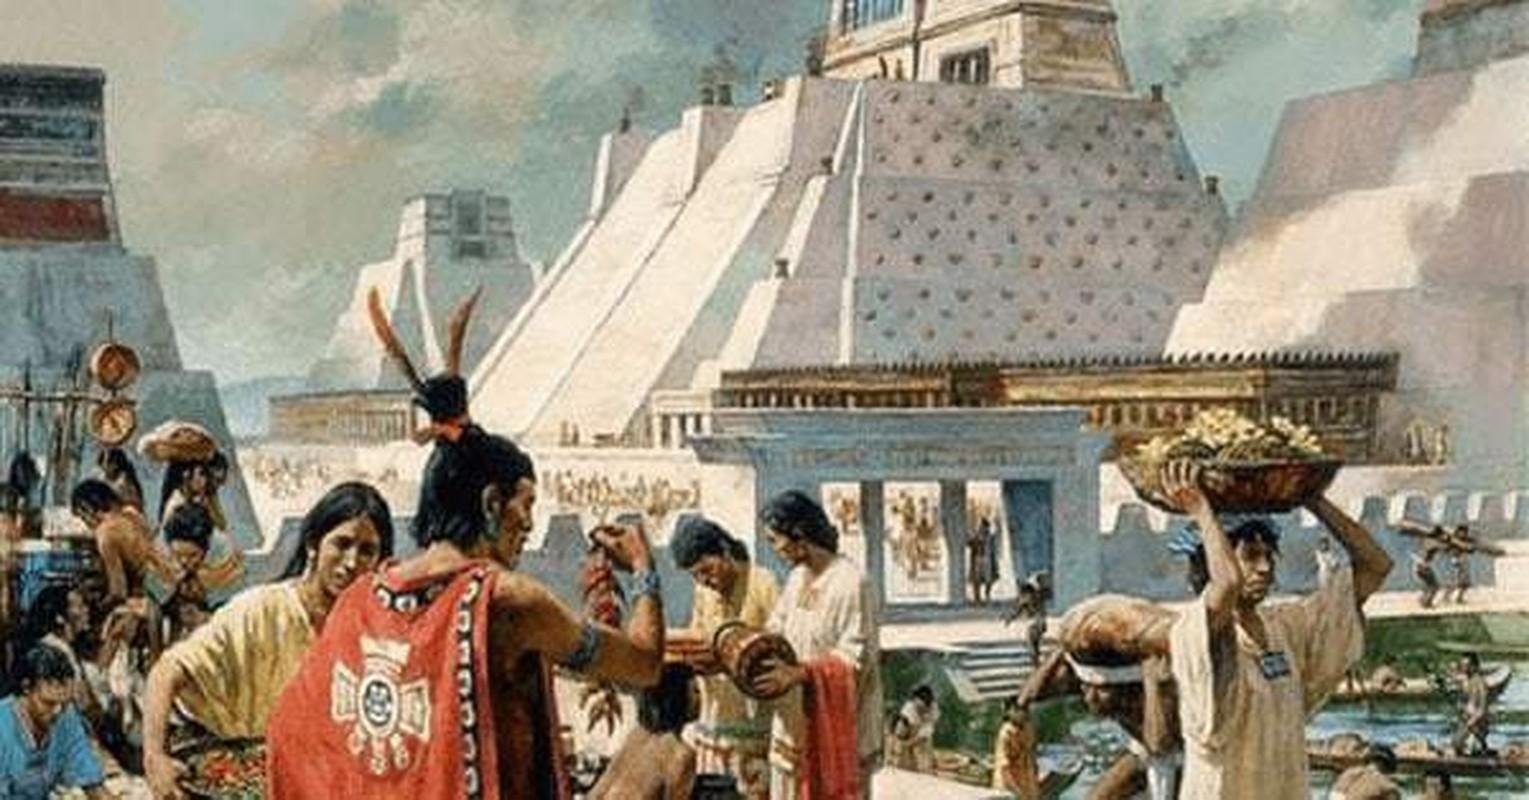 Loi tien tri ly ky ve kinh do cua de che Aztec-Hinh-8